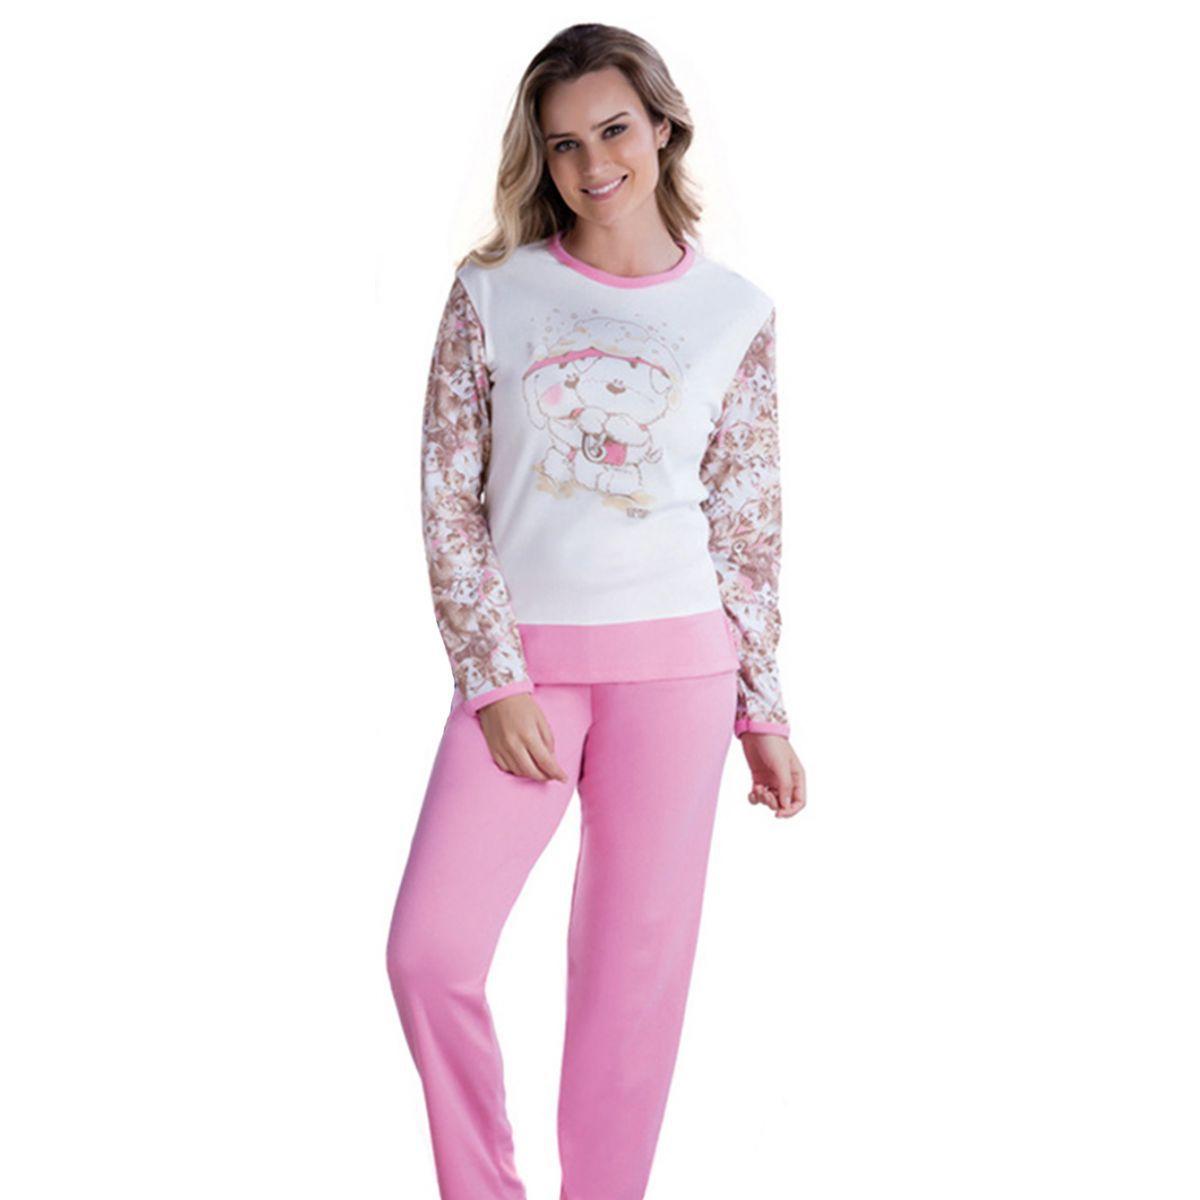 Pijama Feminino Inverno Adulto - Victory 17111